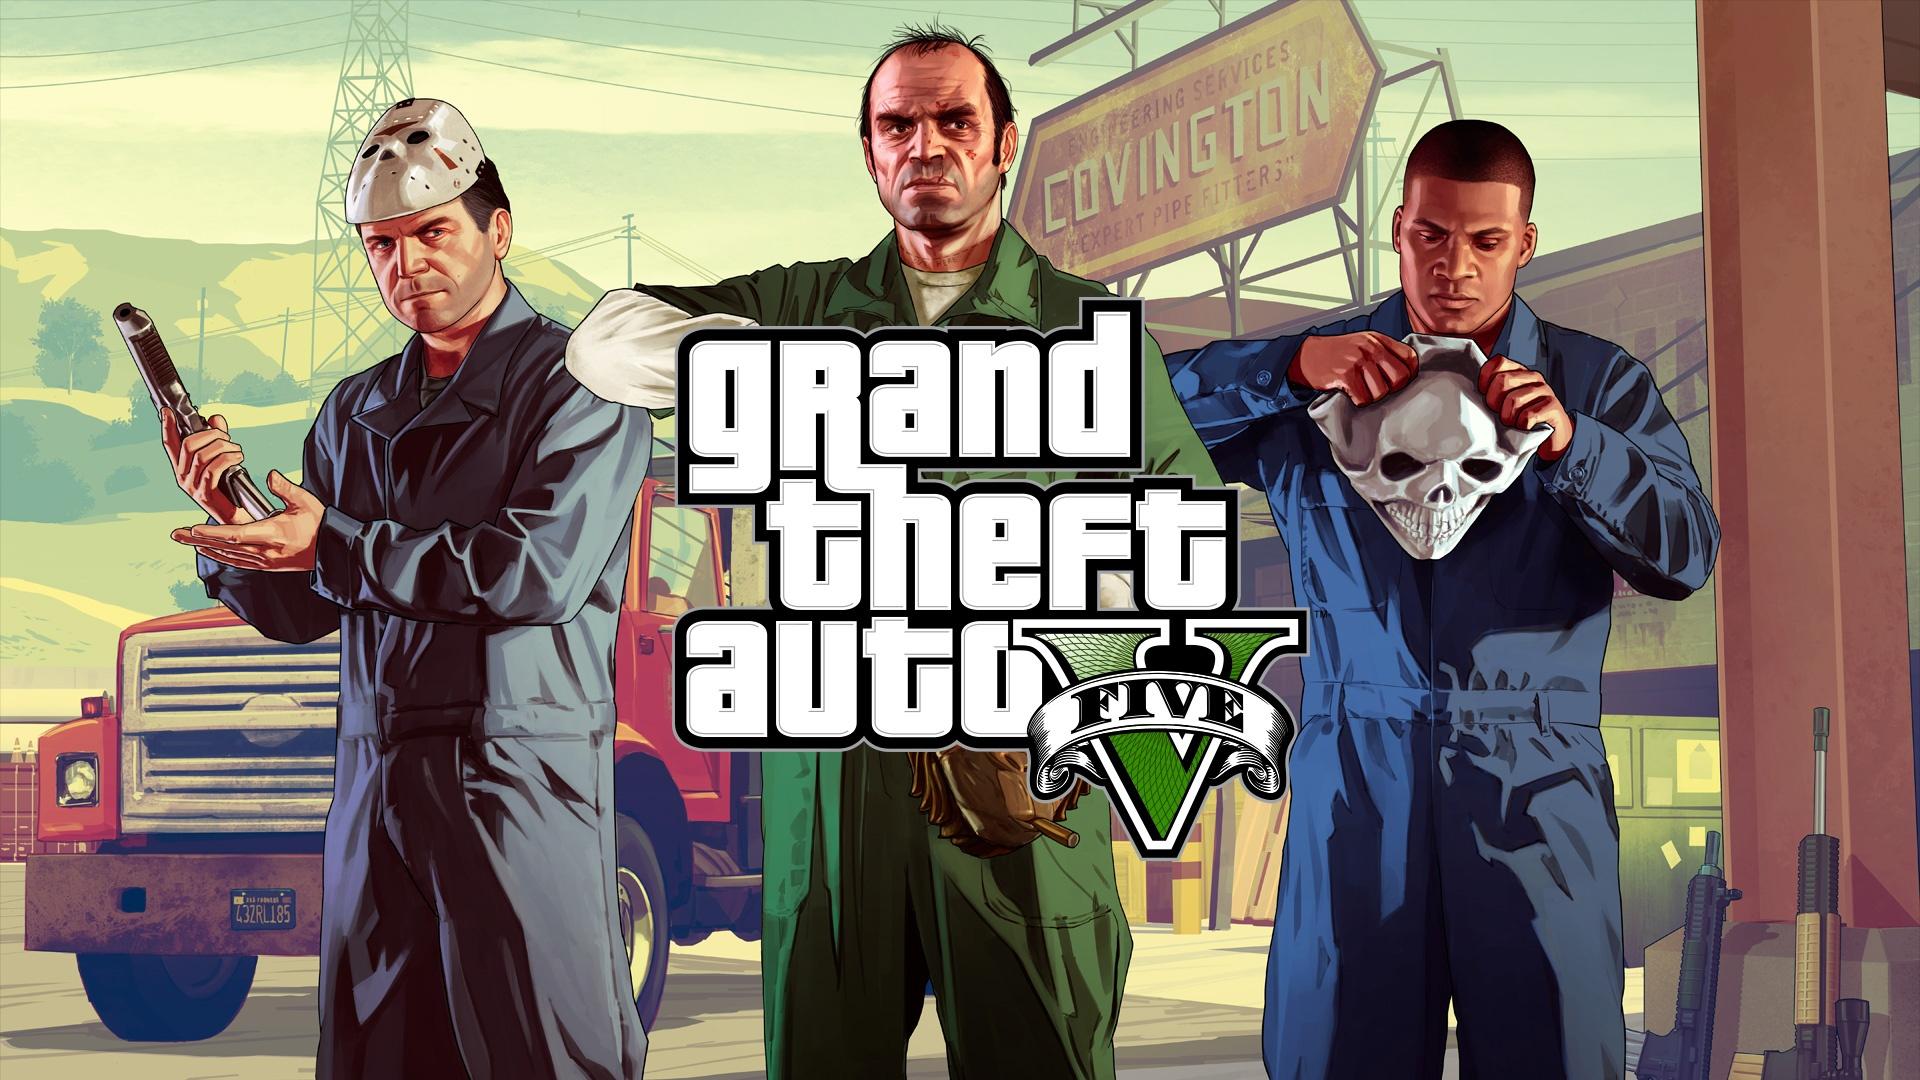 GTA V en tête des ventes sur PS4 en juillet 2018